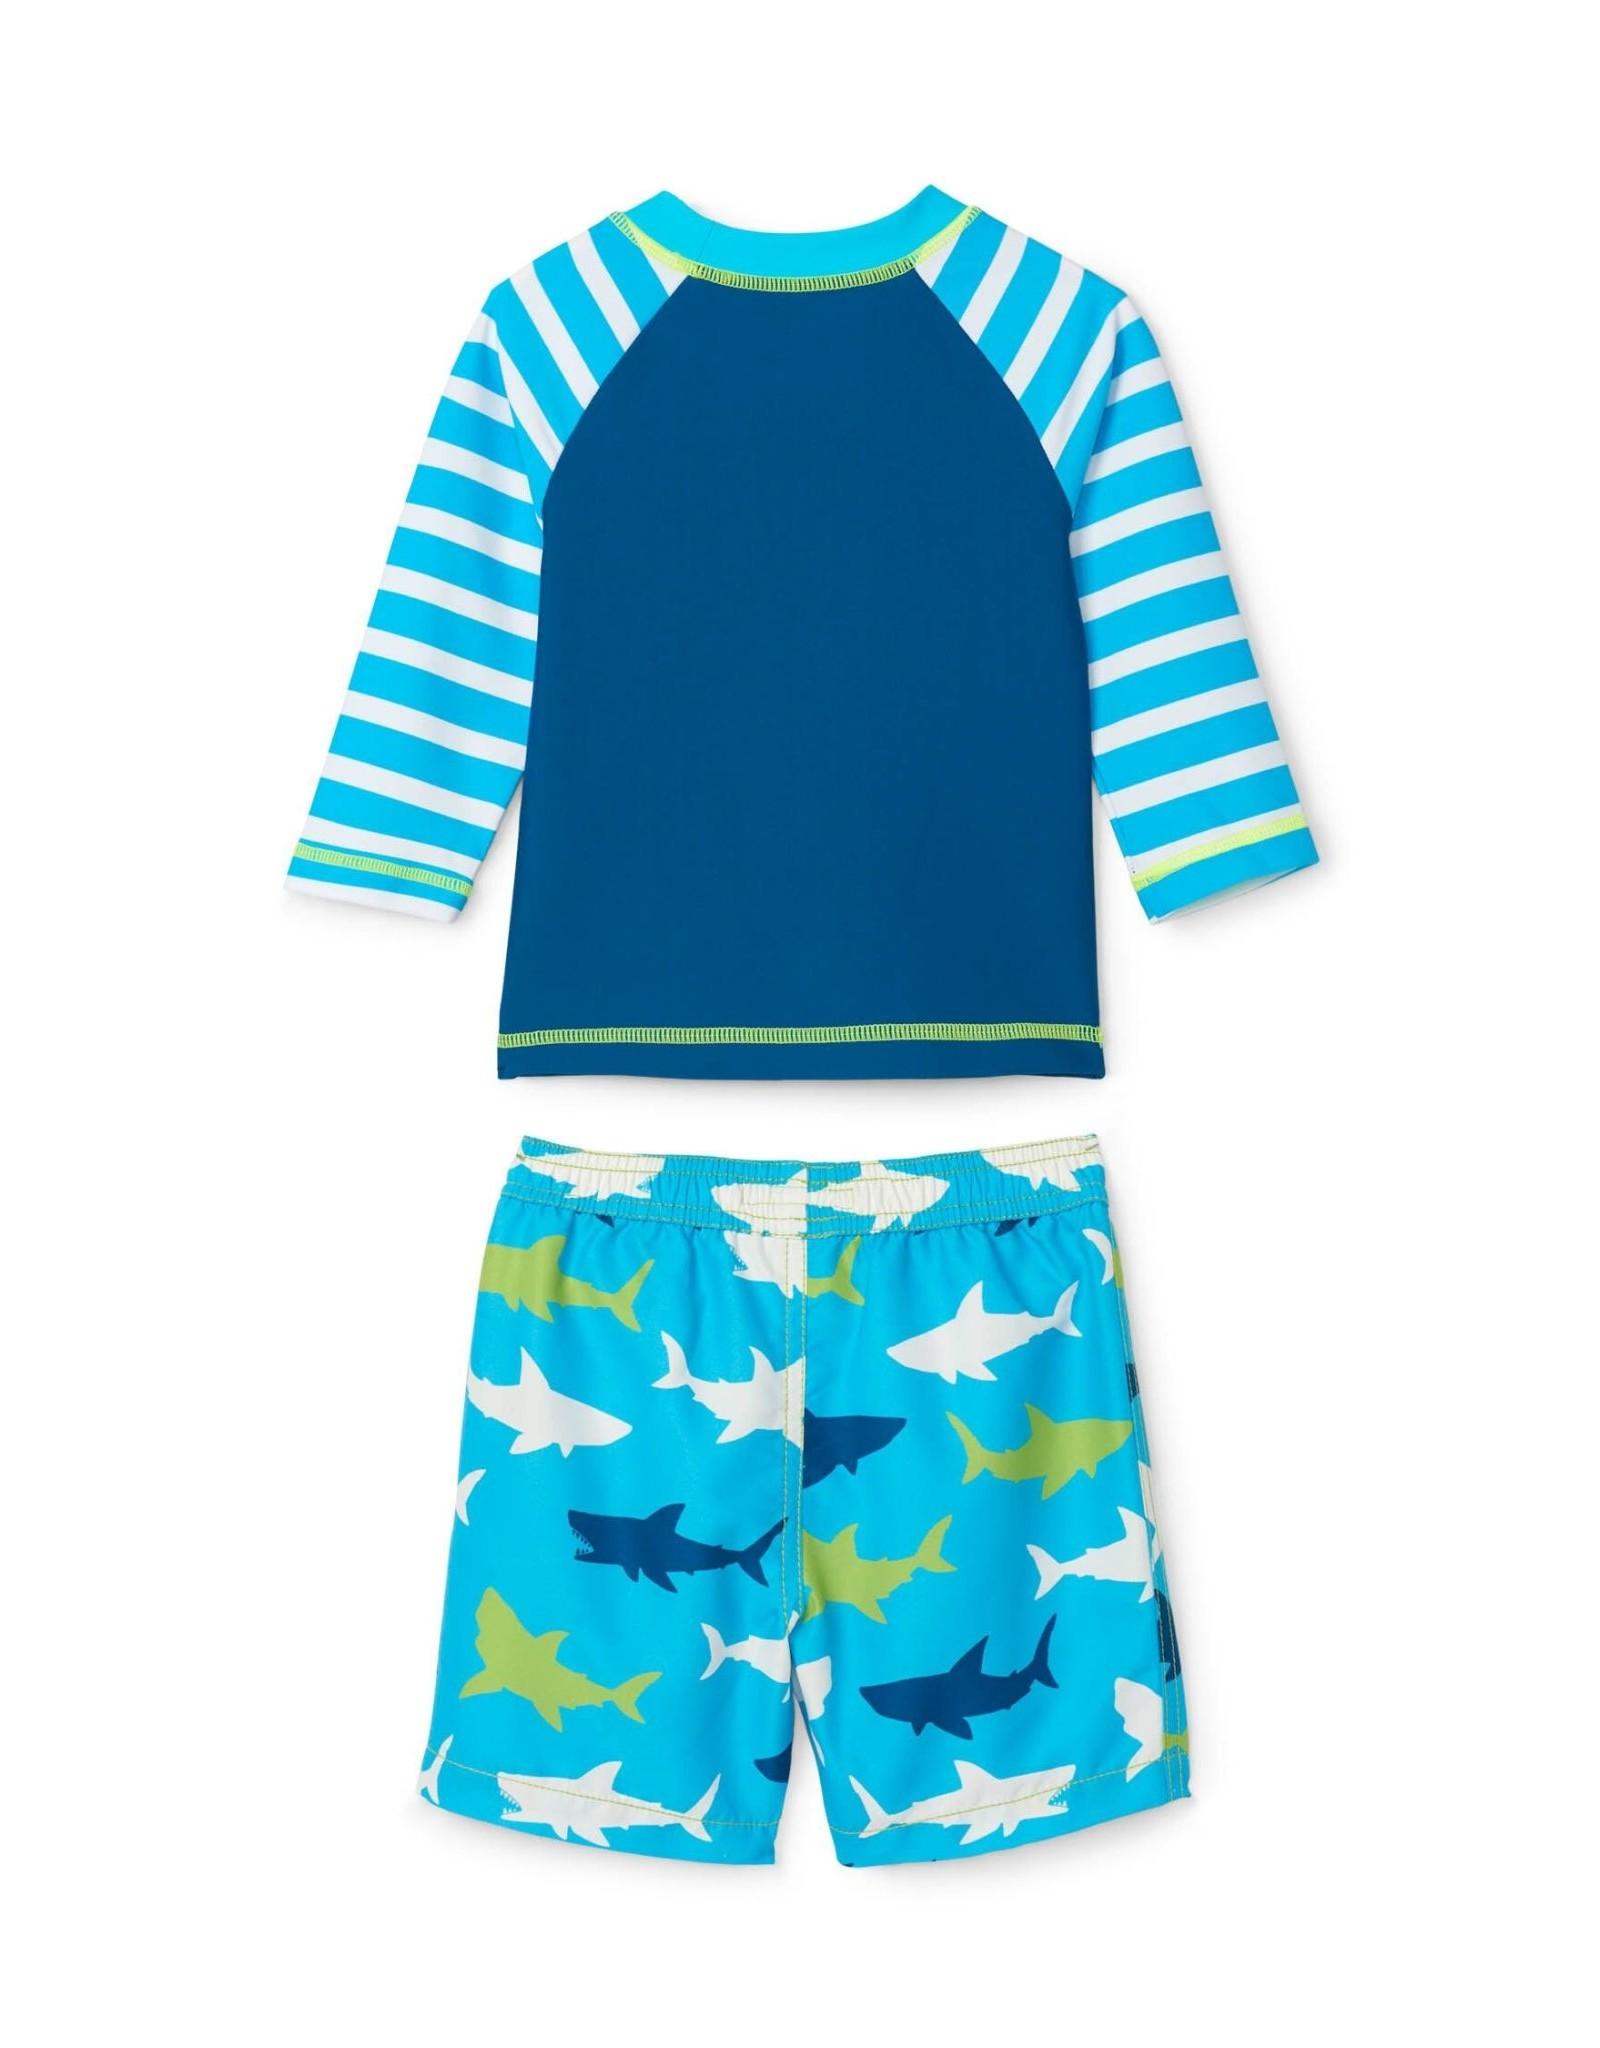 Hatley Great White Shark Baby Rashguard Set